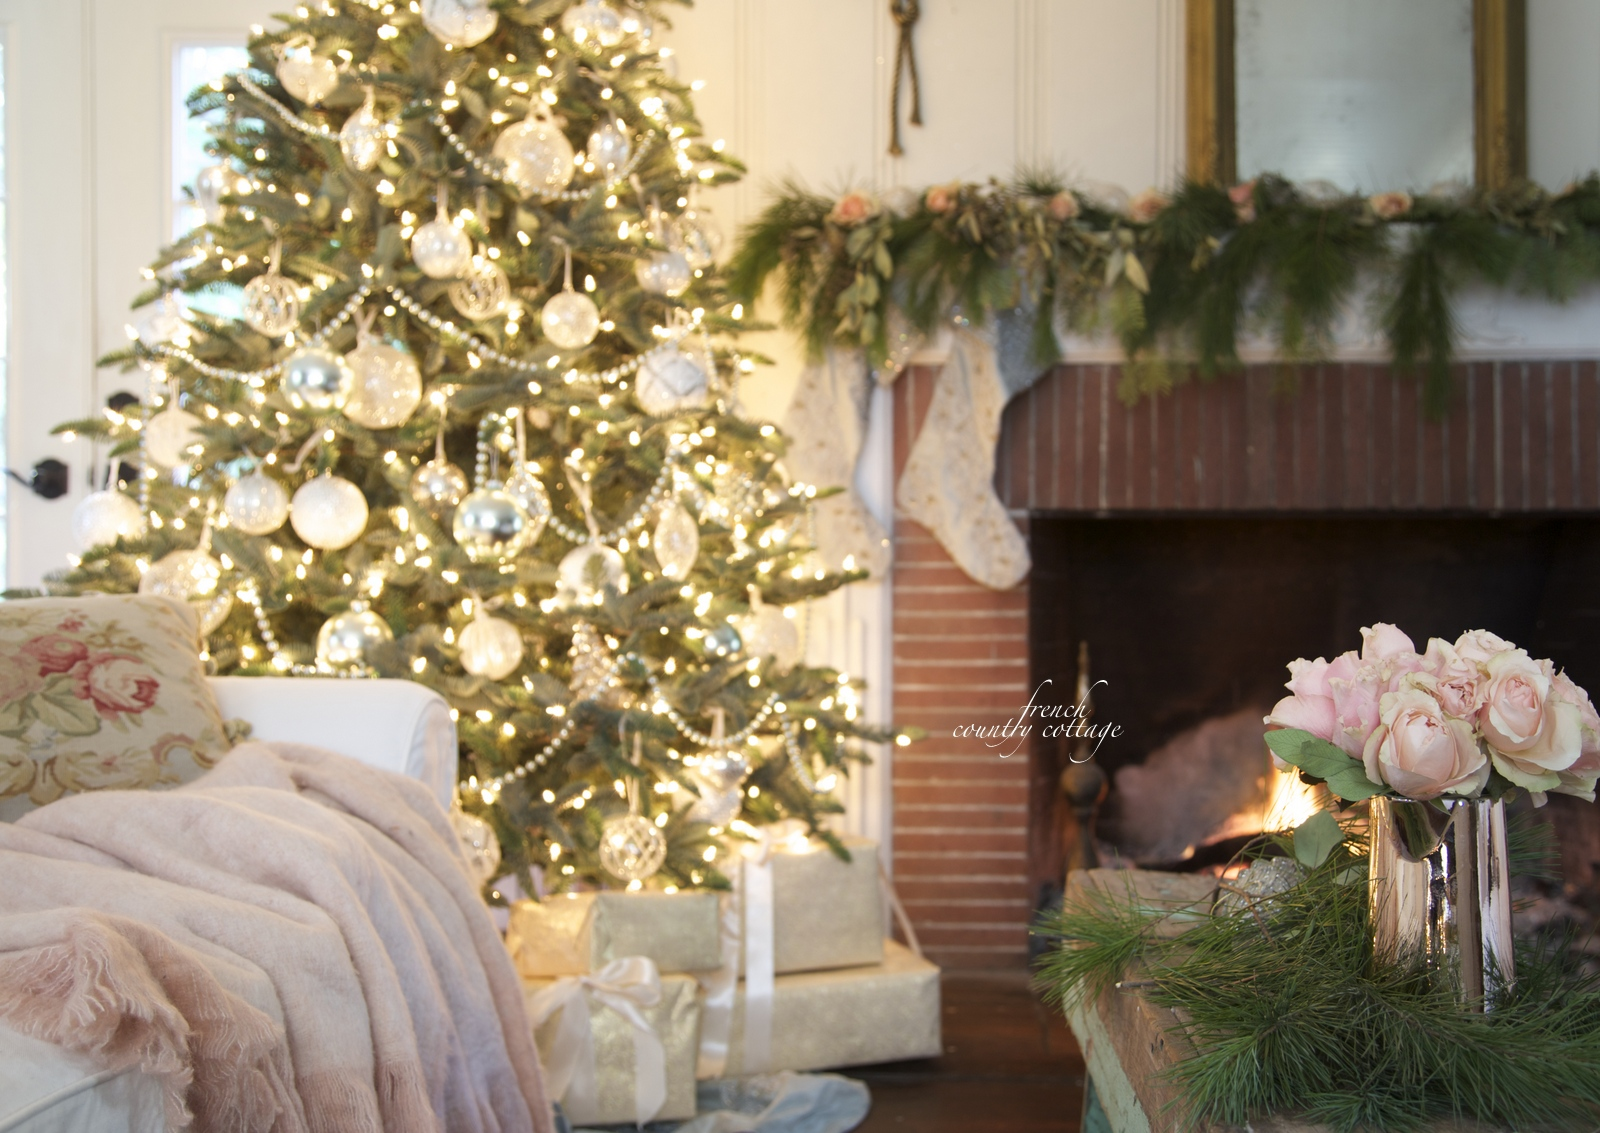 french country cottage decorating ideas french country cottage christmas home holiday decorating UQWDNAU